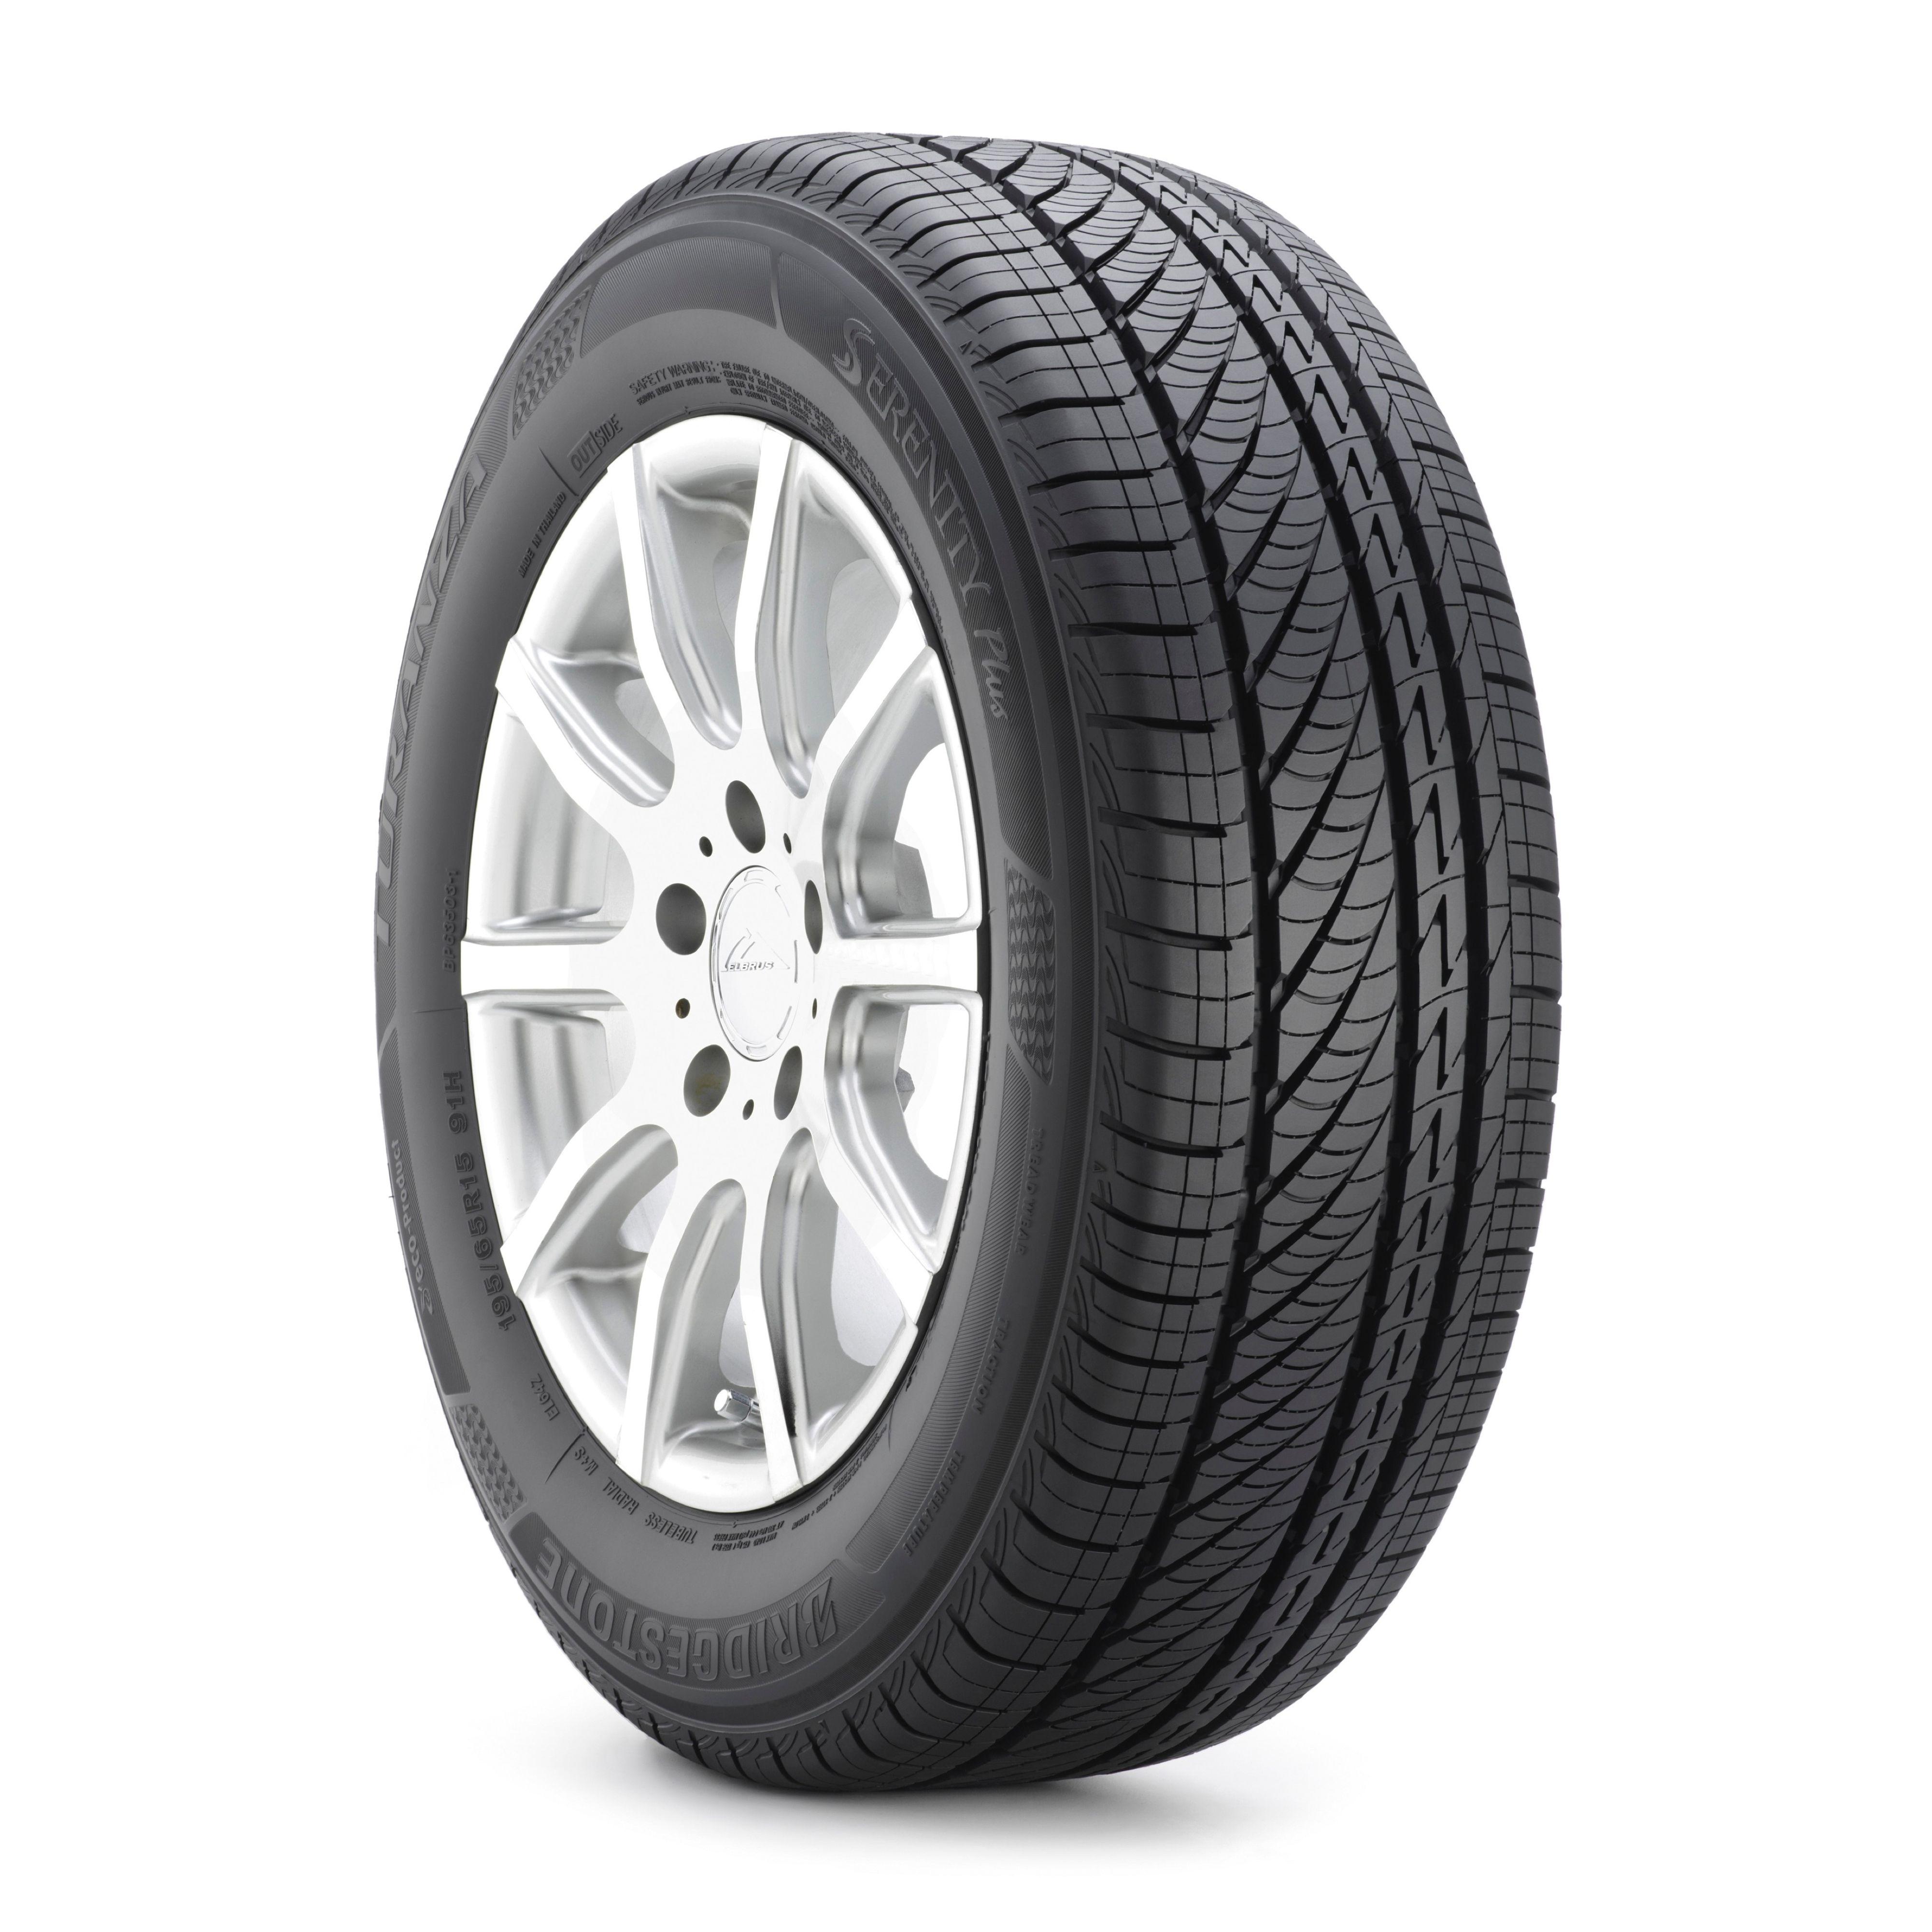 Scrollable View Bridgestone Tires Tire Serenity